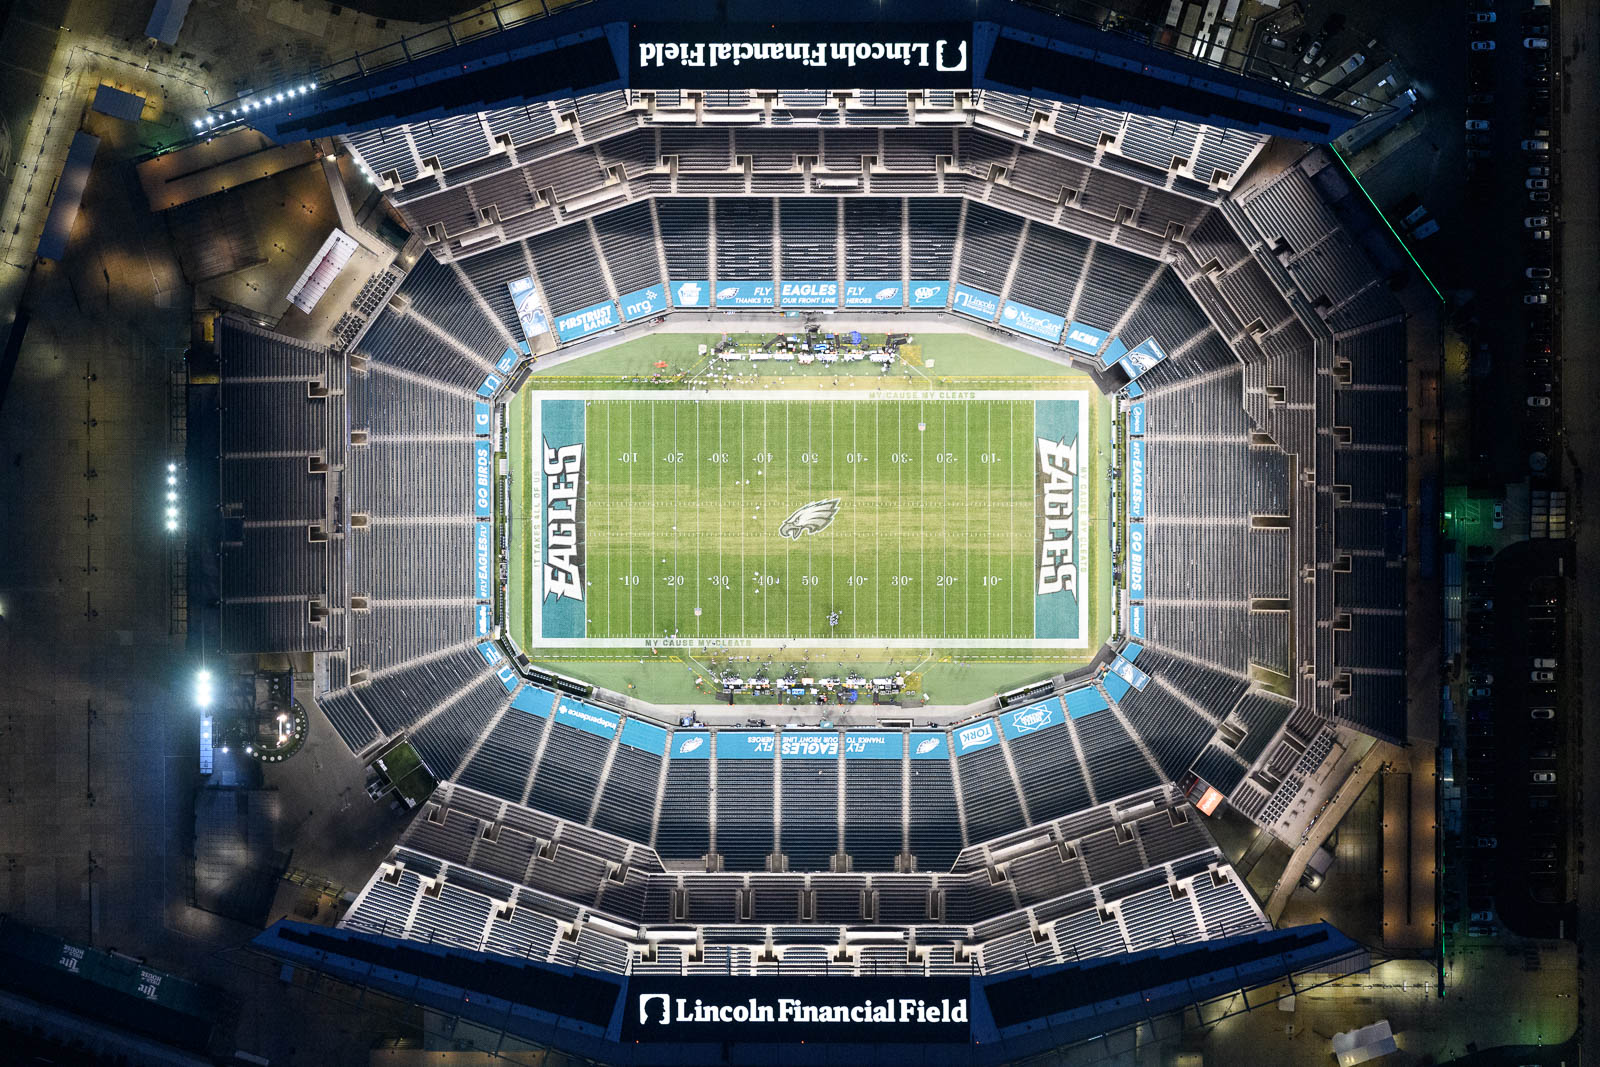 Eagles play Washington at the empty Lincoln Financial Field (Nov 11, 2020)